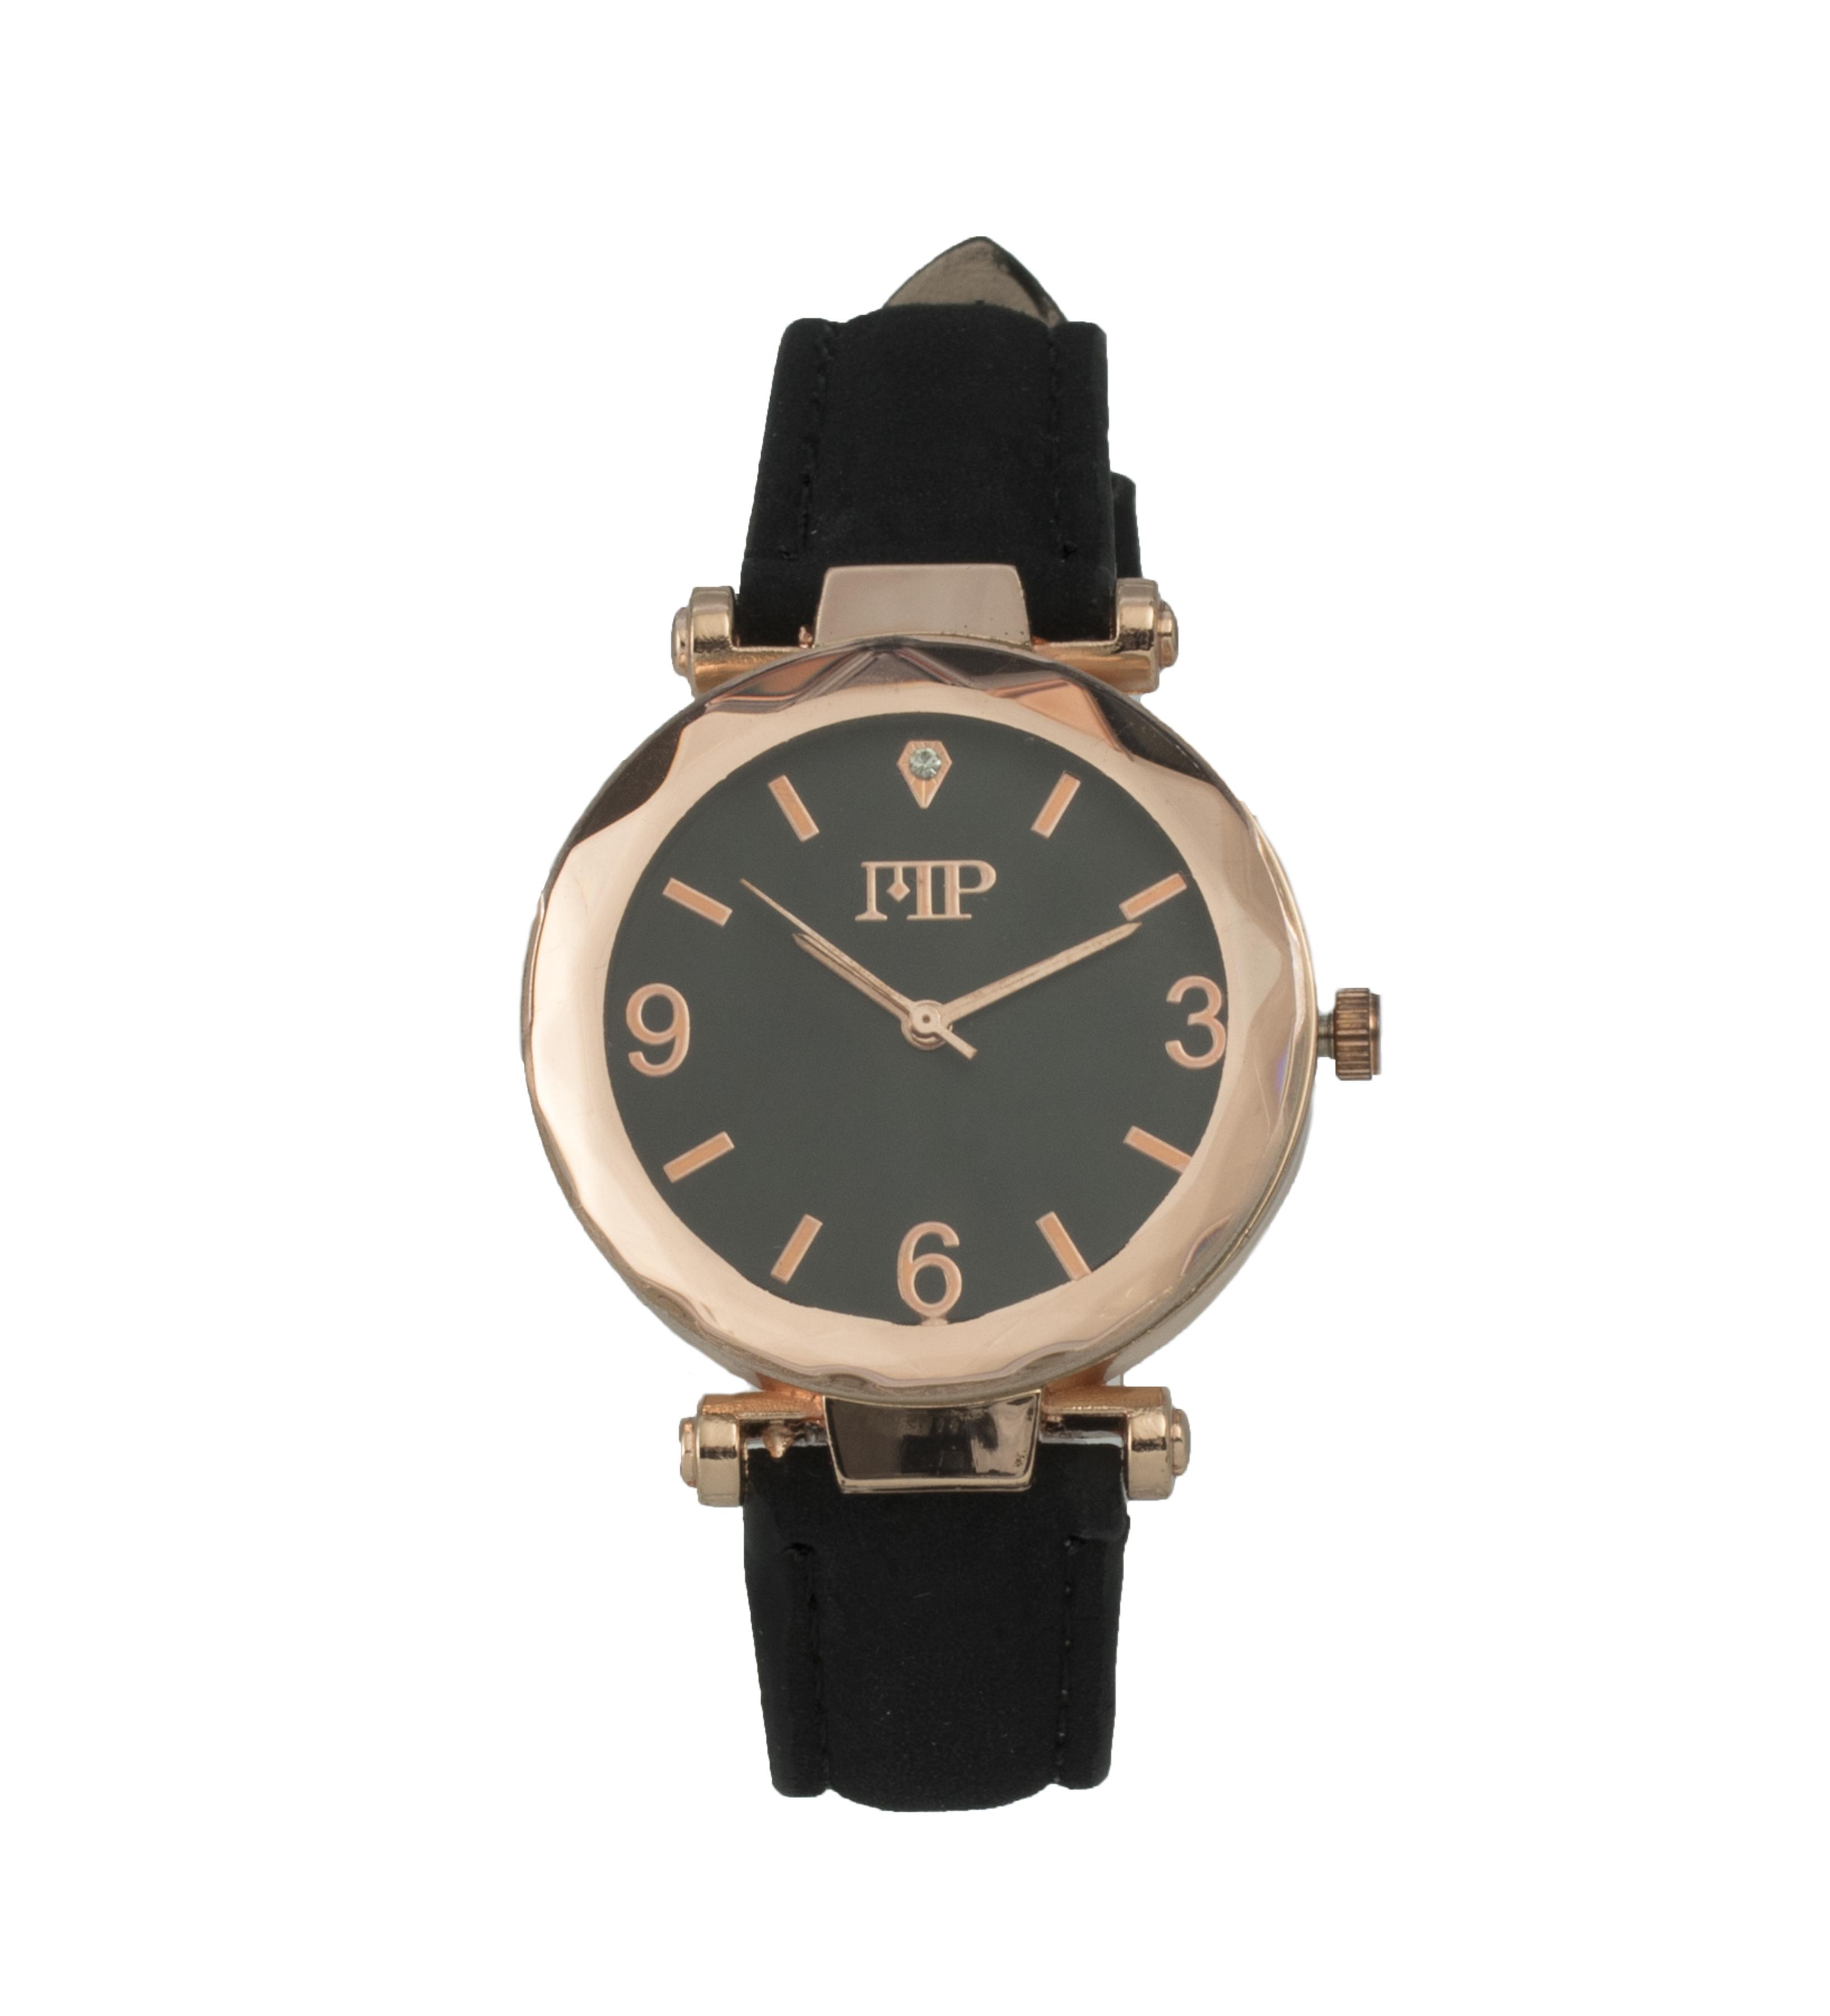 Comprar Marsan Piel Relógio analógico preto Goldstein